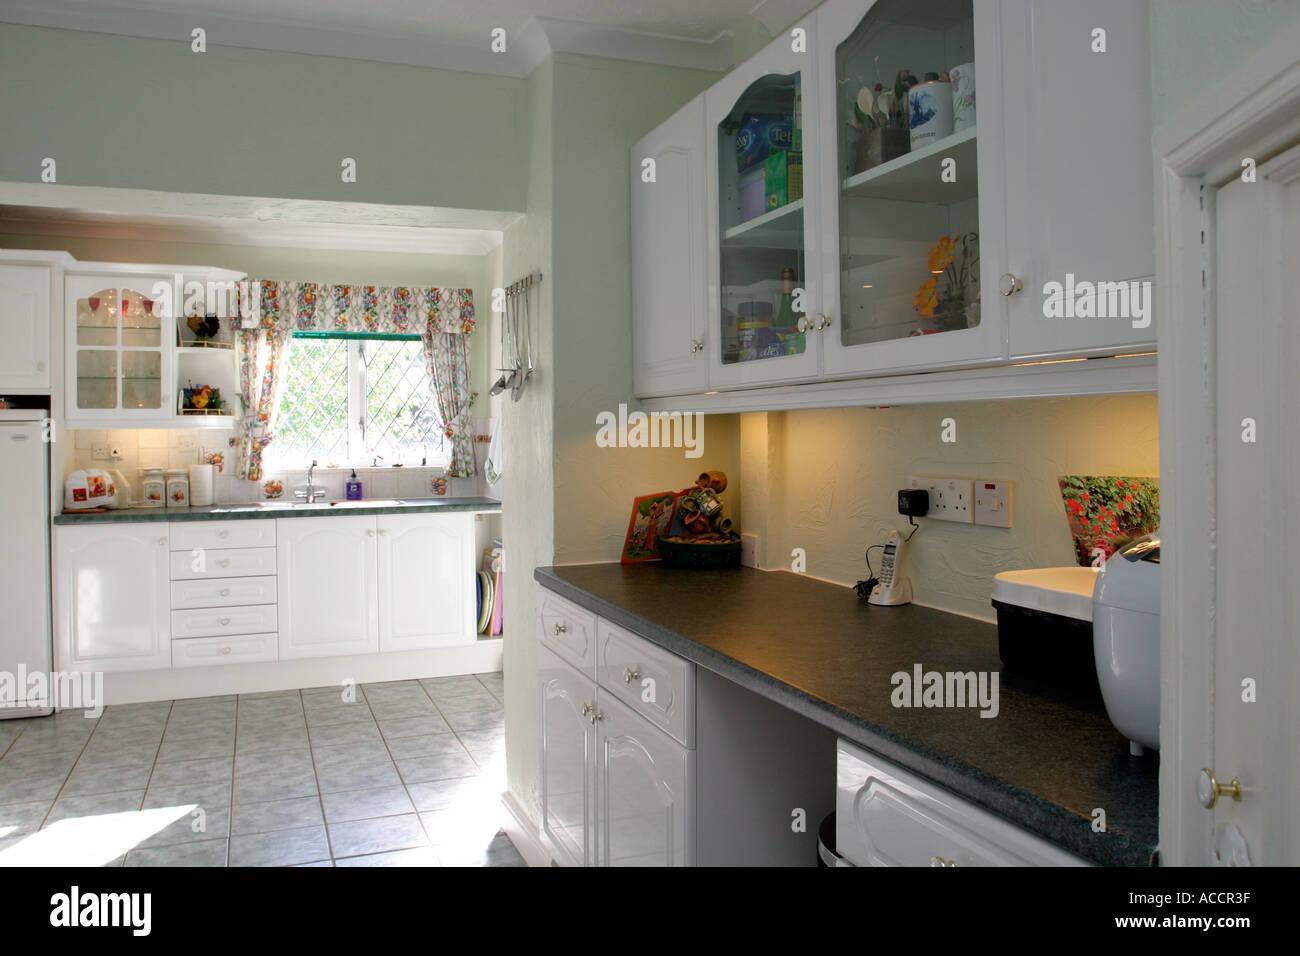 Skirting Stockfotos & Skirting Bilder - Alamy